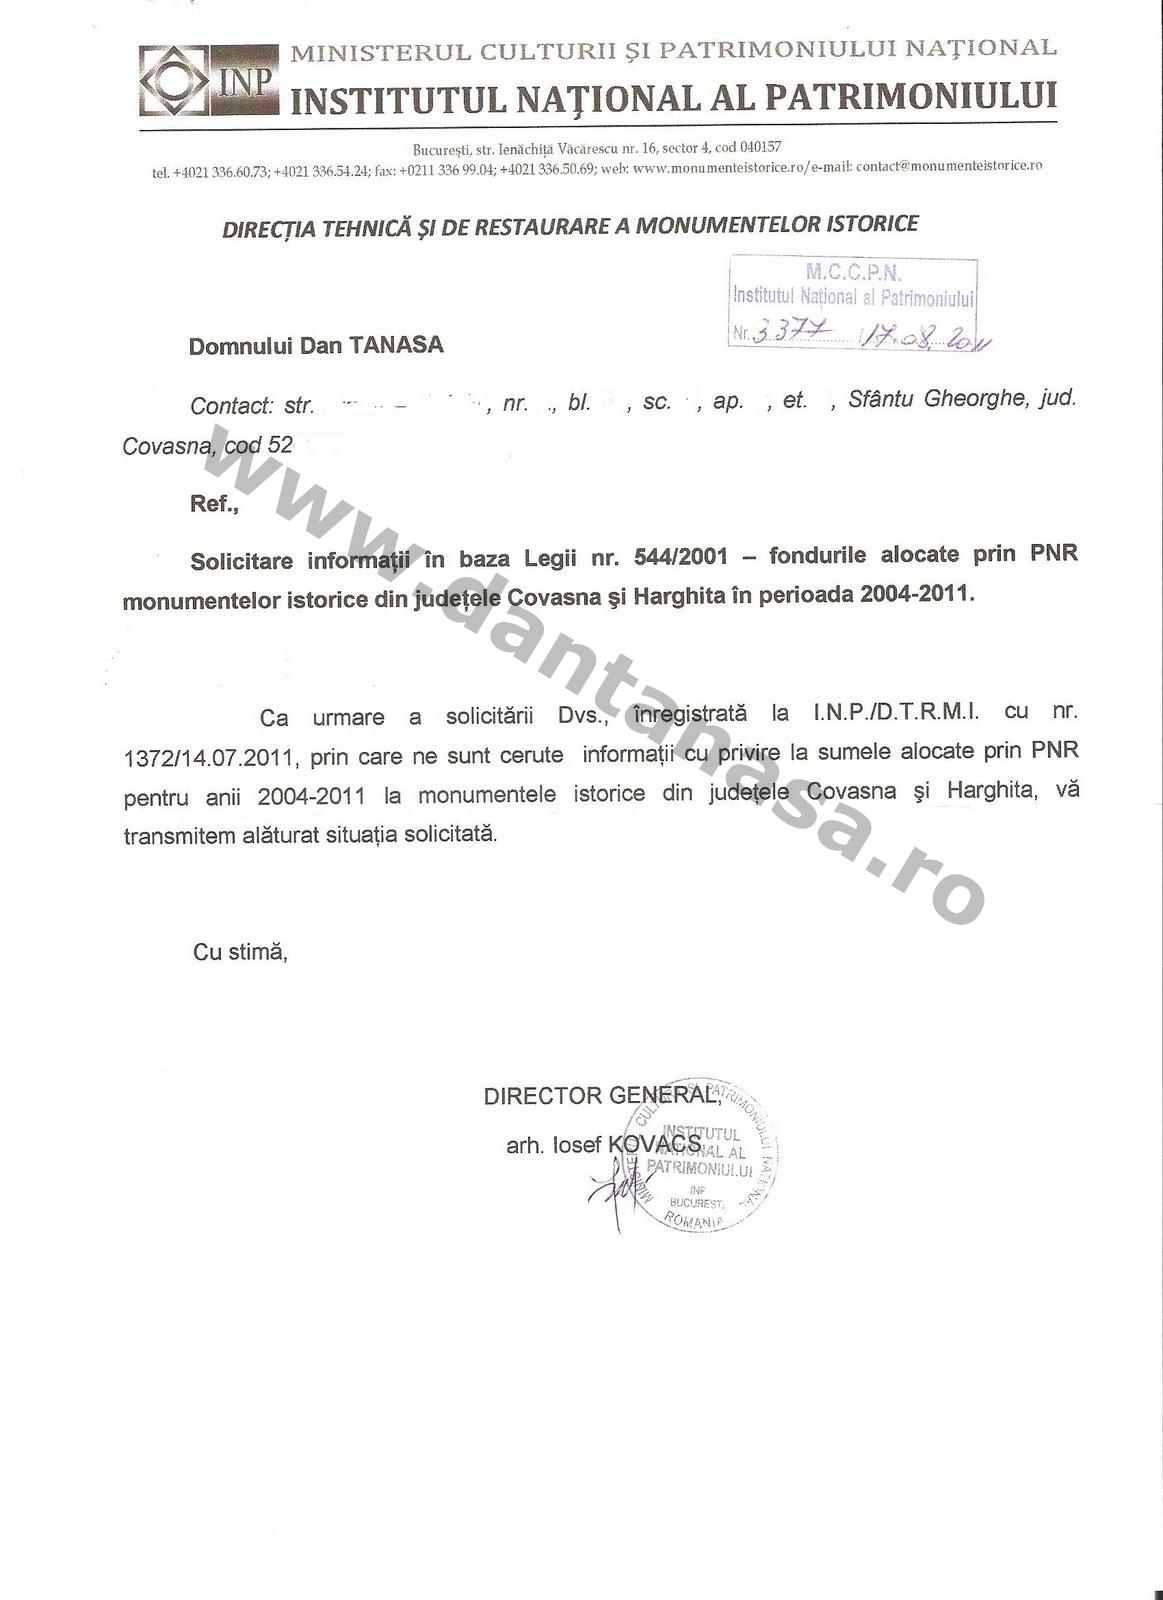 Ministerul Culturii UDMR Kelemen Hunor Dan Tanasa fonduri monumente Covasna Harghita